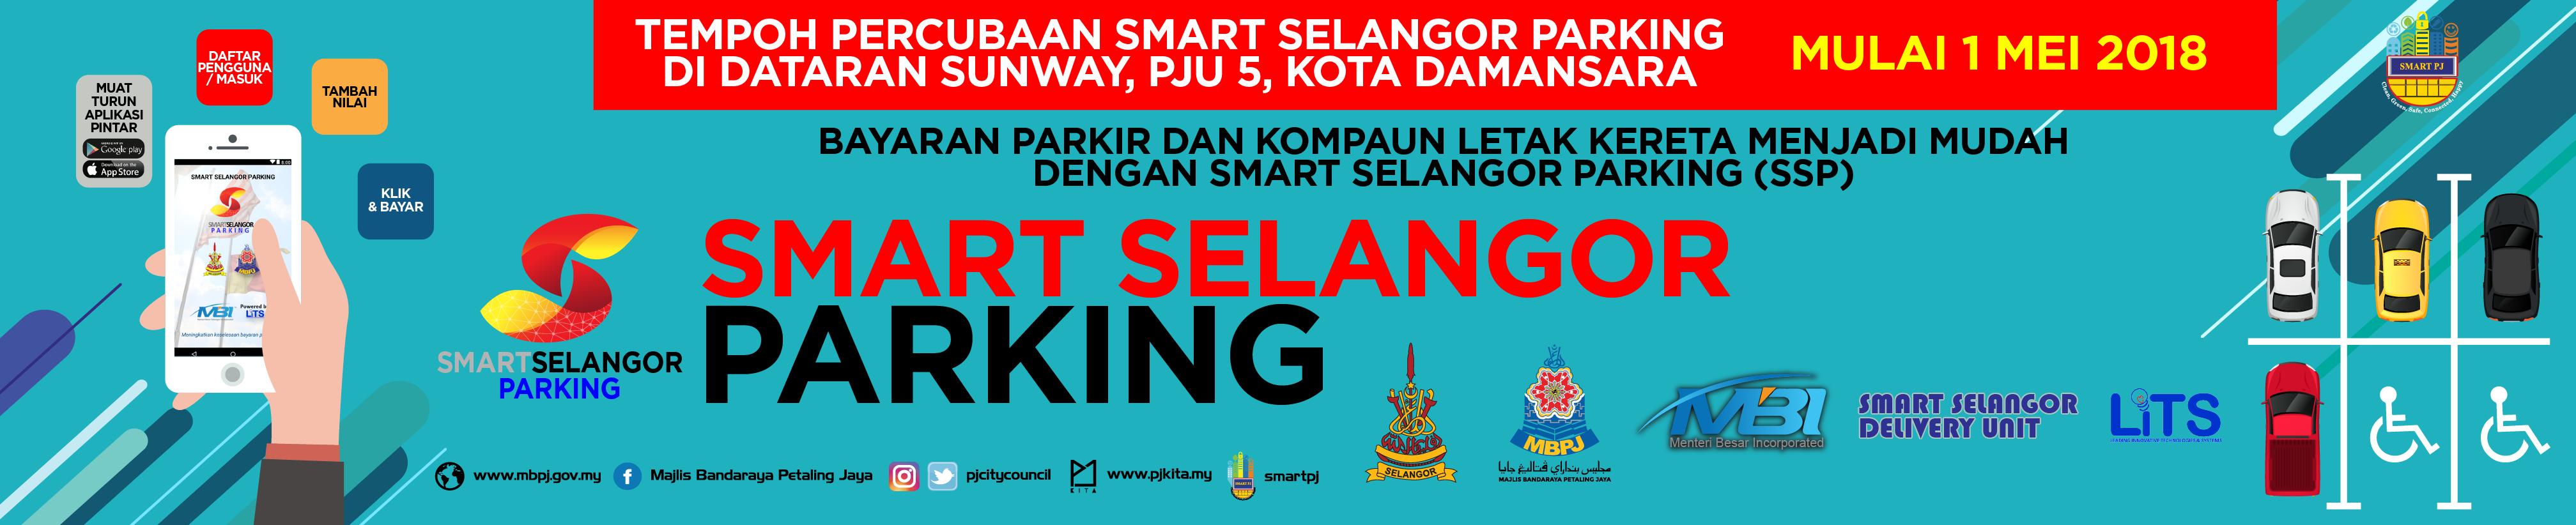 Banner Smart Parking Selangor